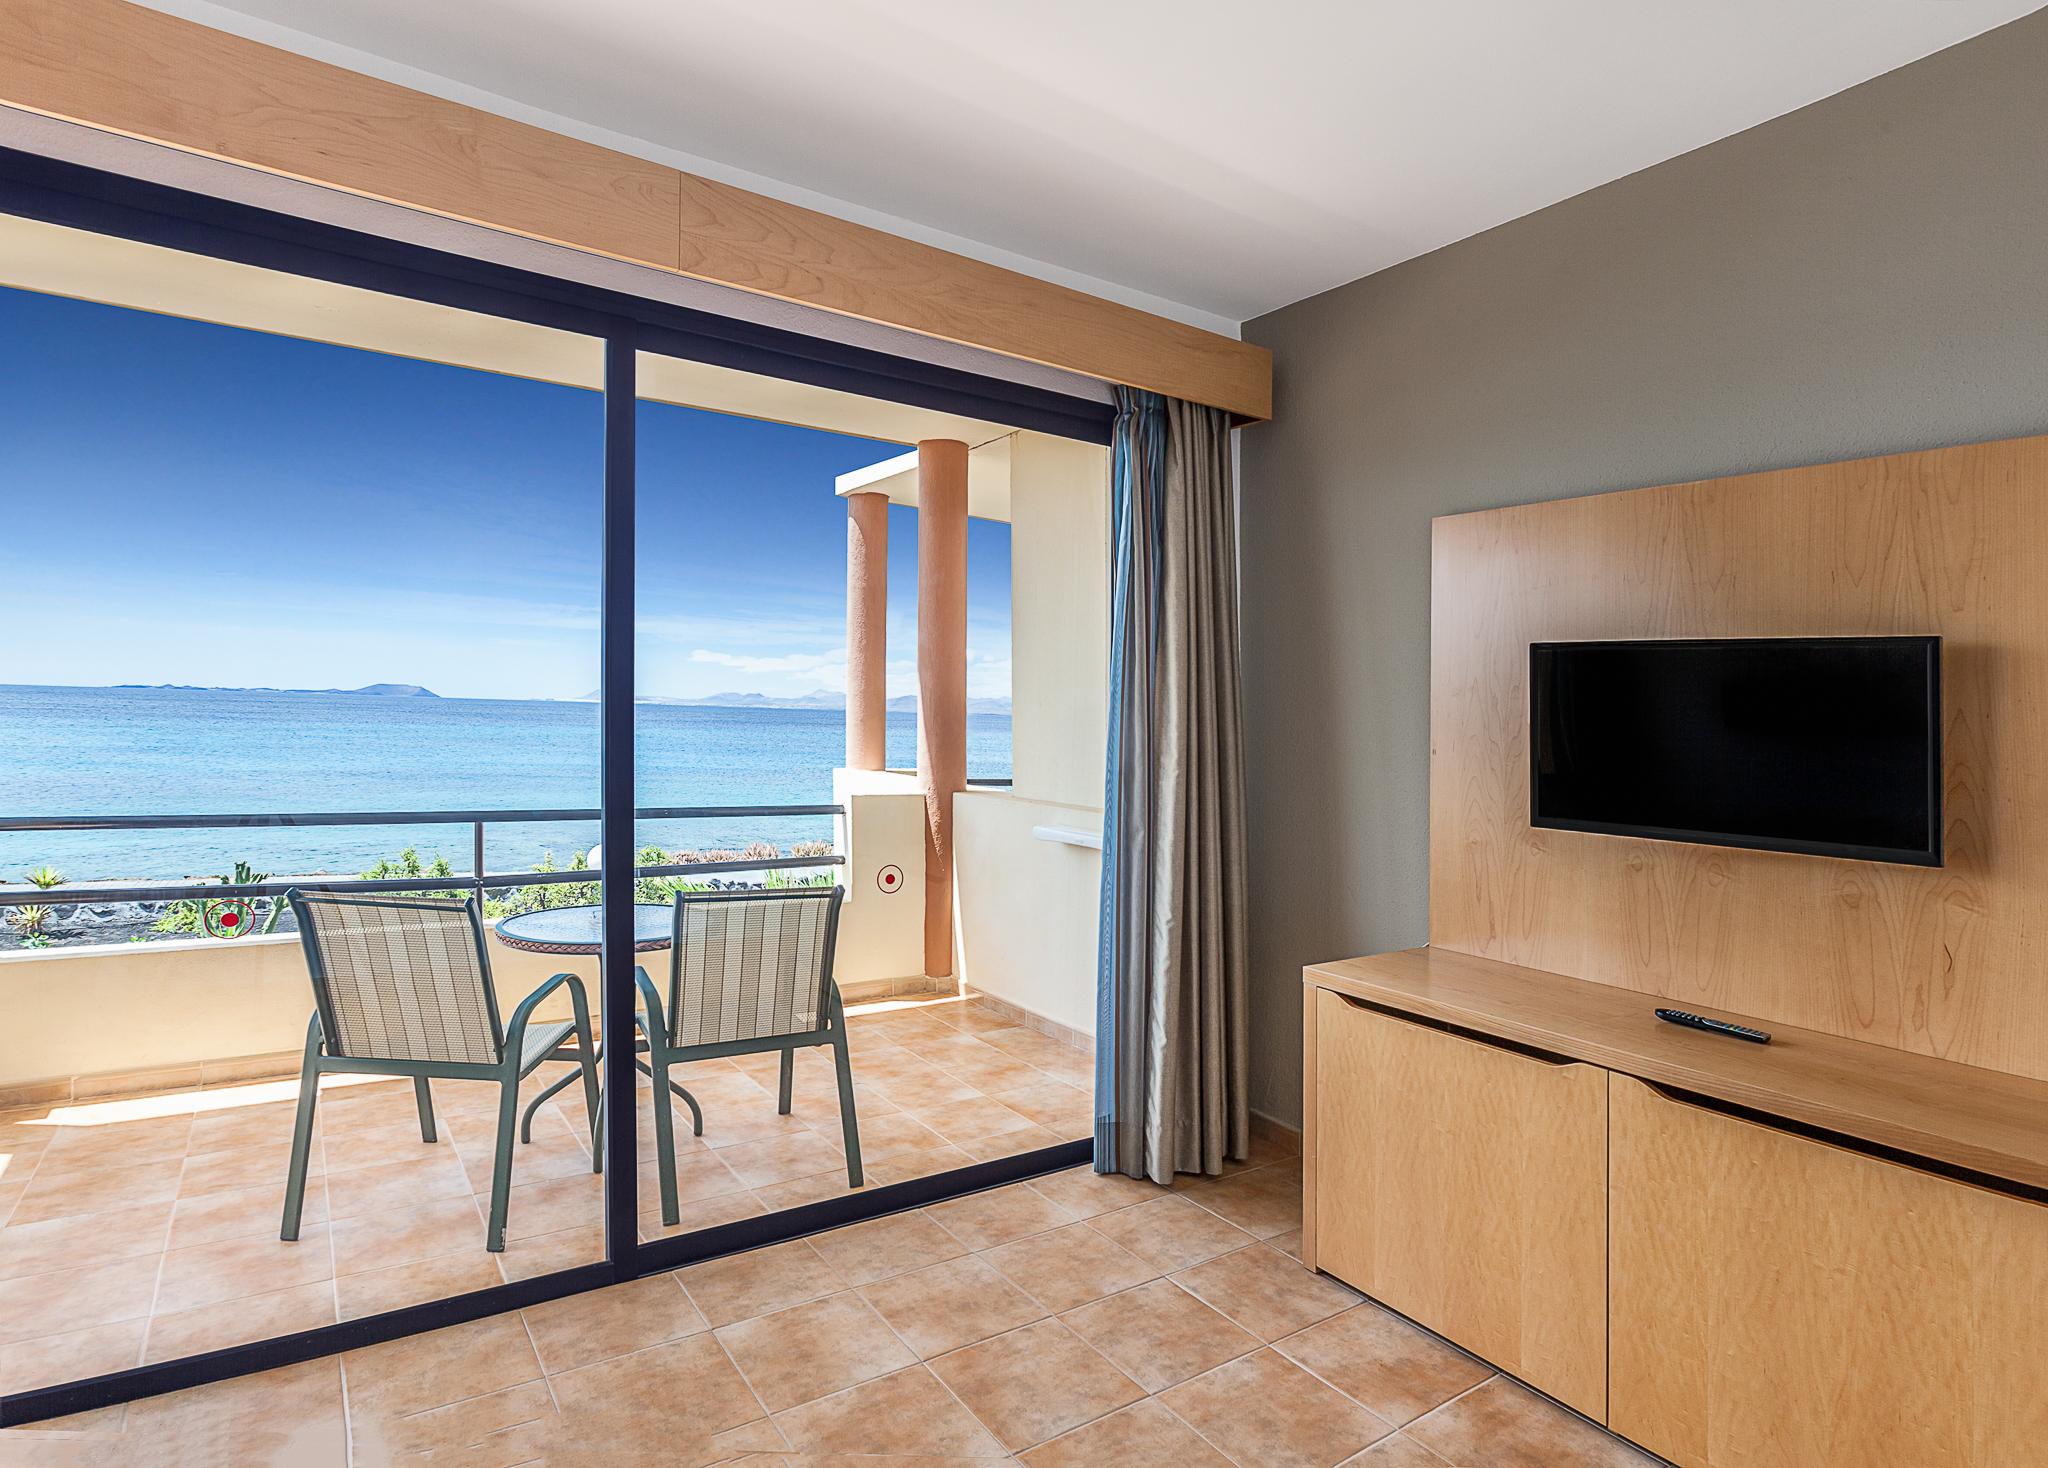 hotel room-1 copia